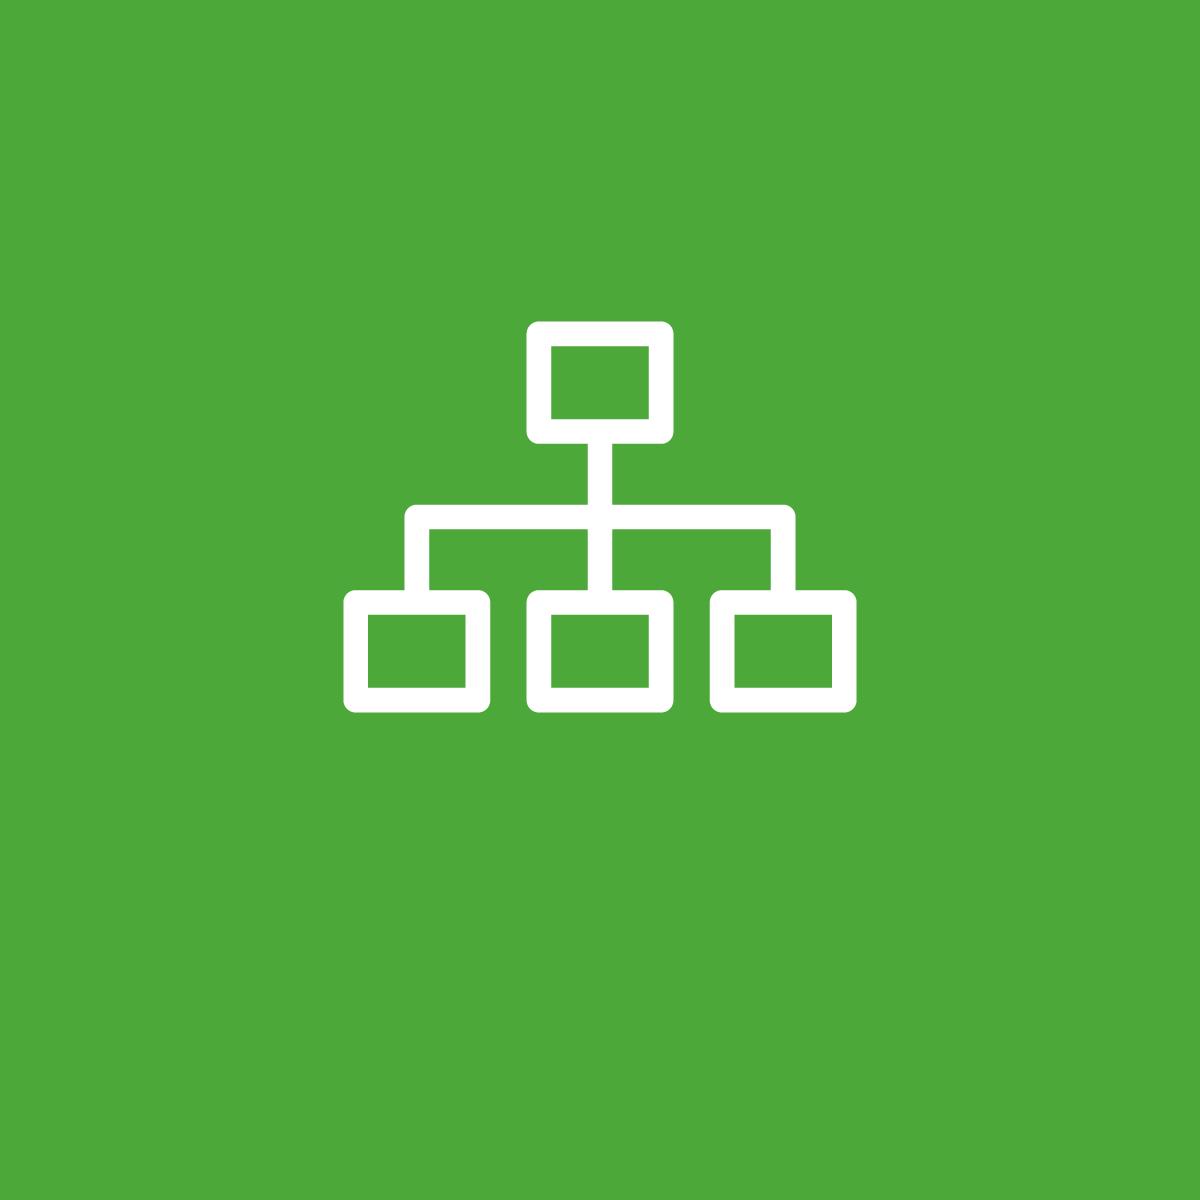 36pt - Mapa de arquitectura de marca